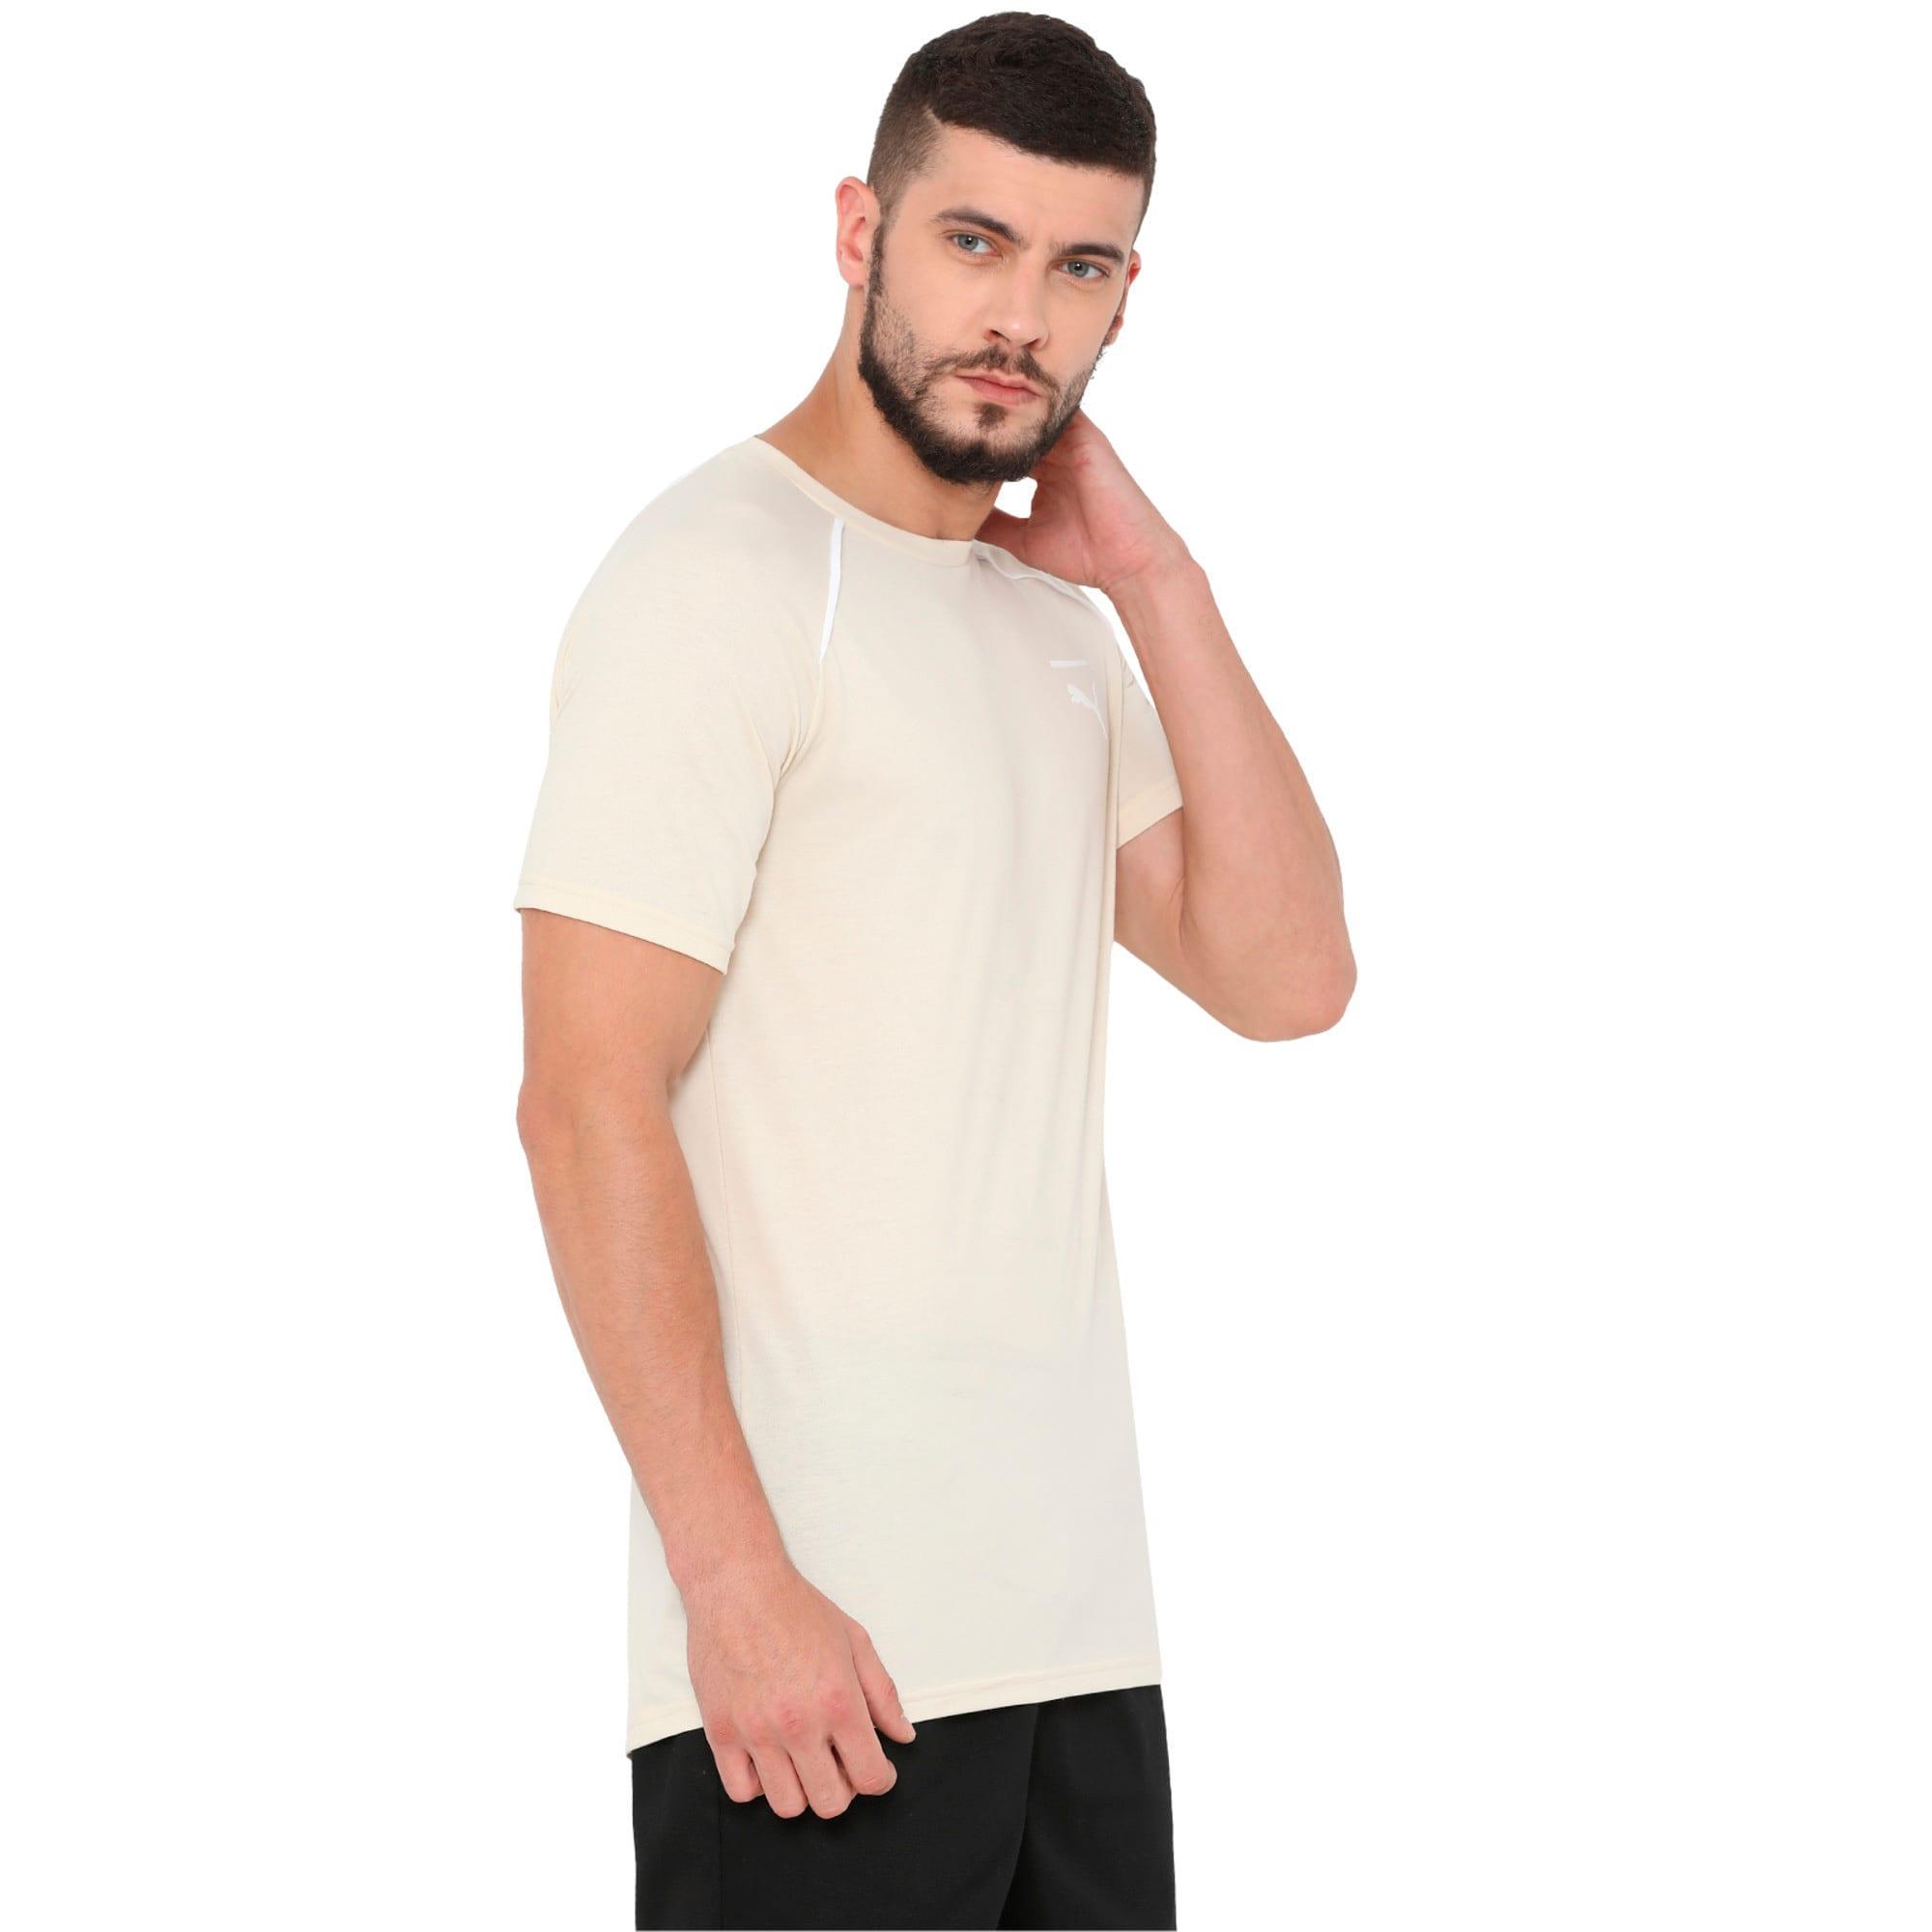 Thumbnail 1 of Evolution Men's Core T-Shirt, Birch, medium-IND